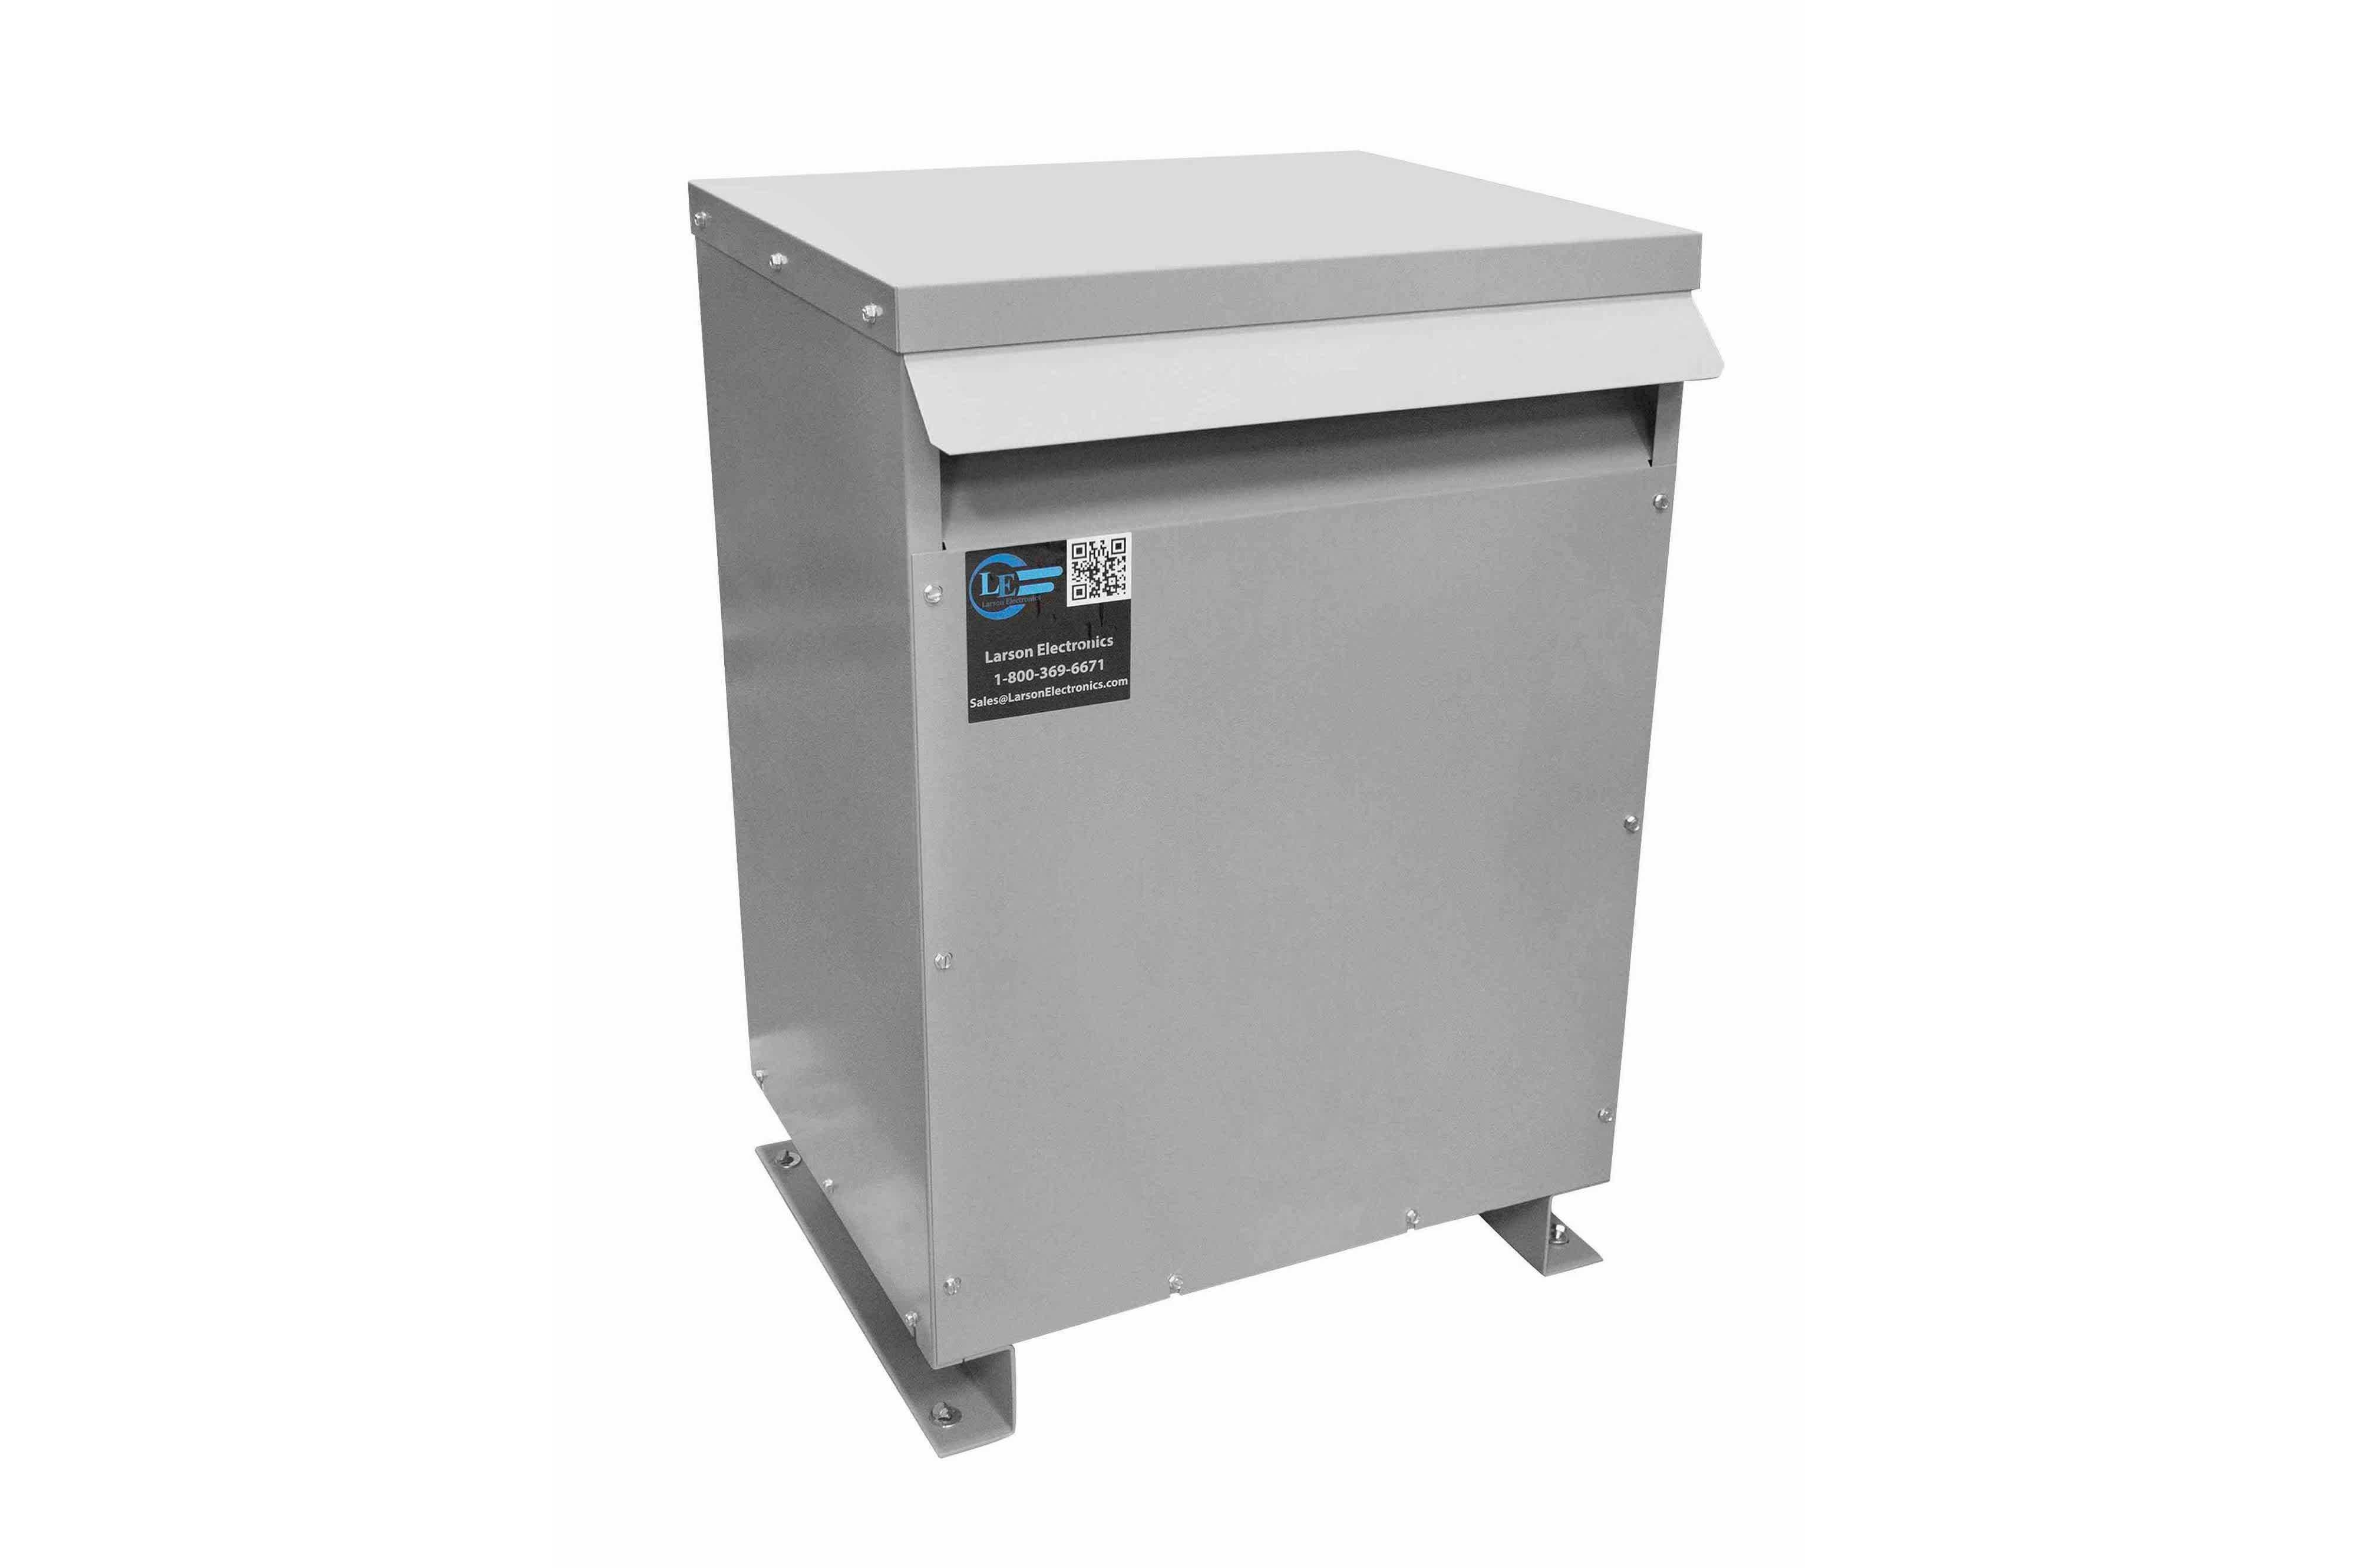 14 kVA 3PH Isolation Transformer, 240V Wye Primary, 400Y/231 Wye-N Secondary, N3R, Ventilated, 60 Hz